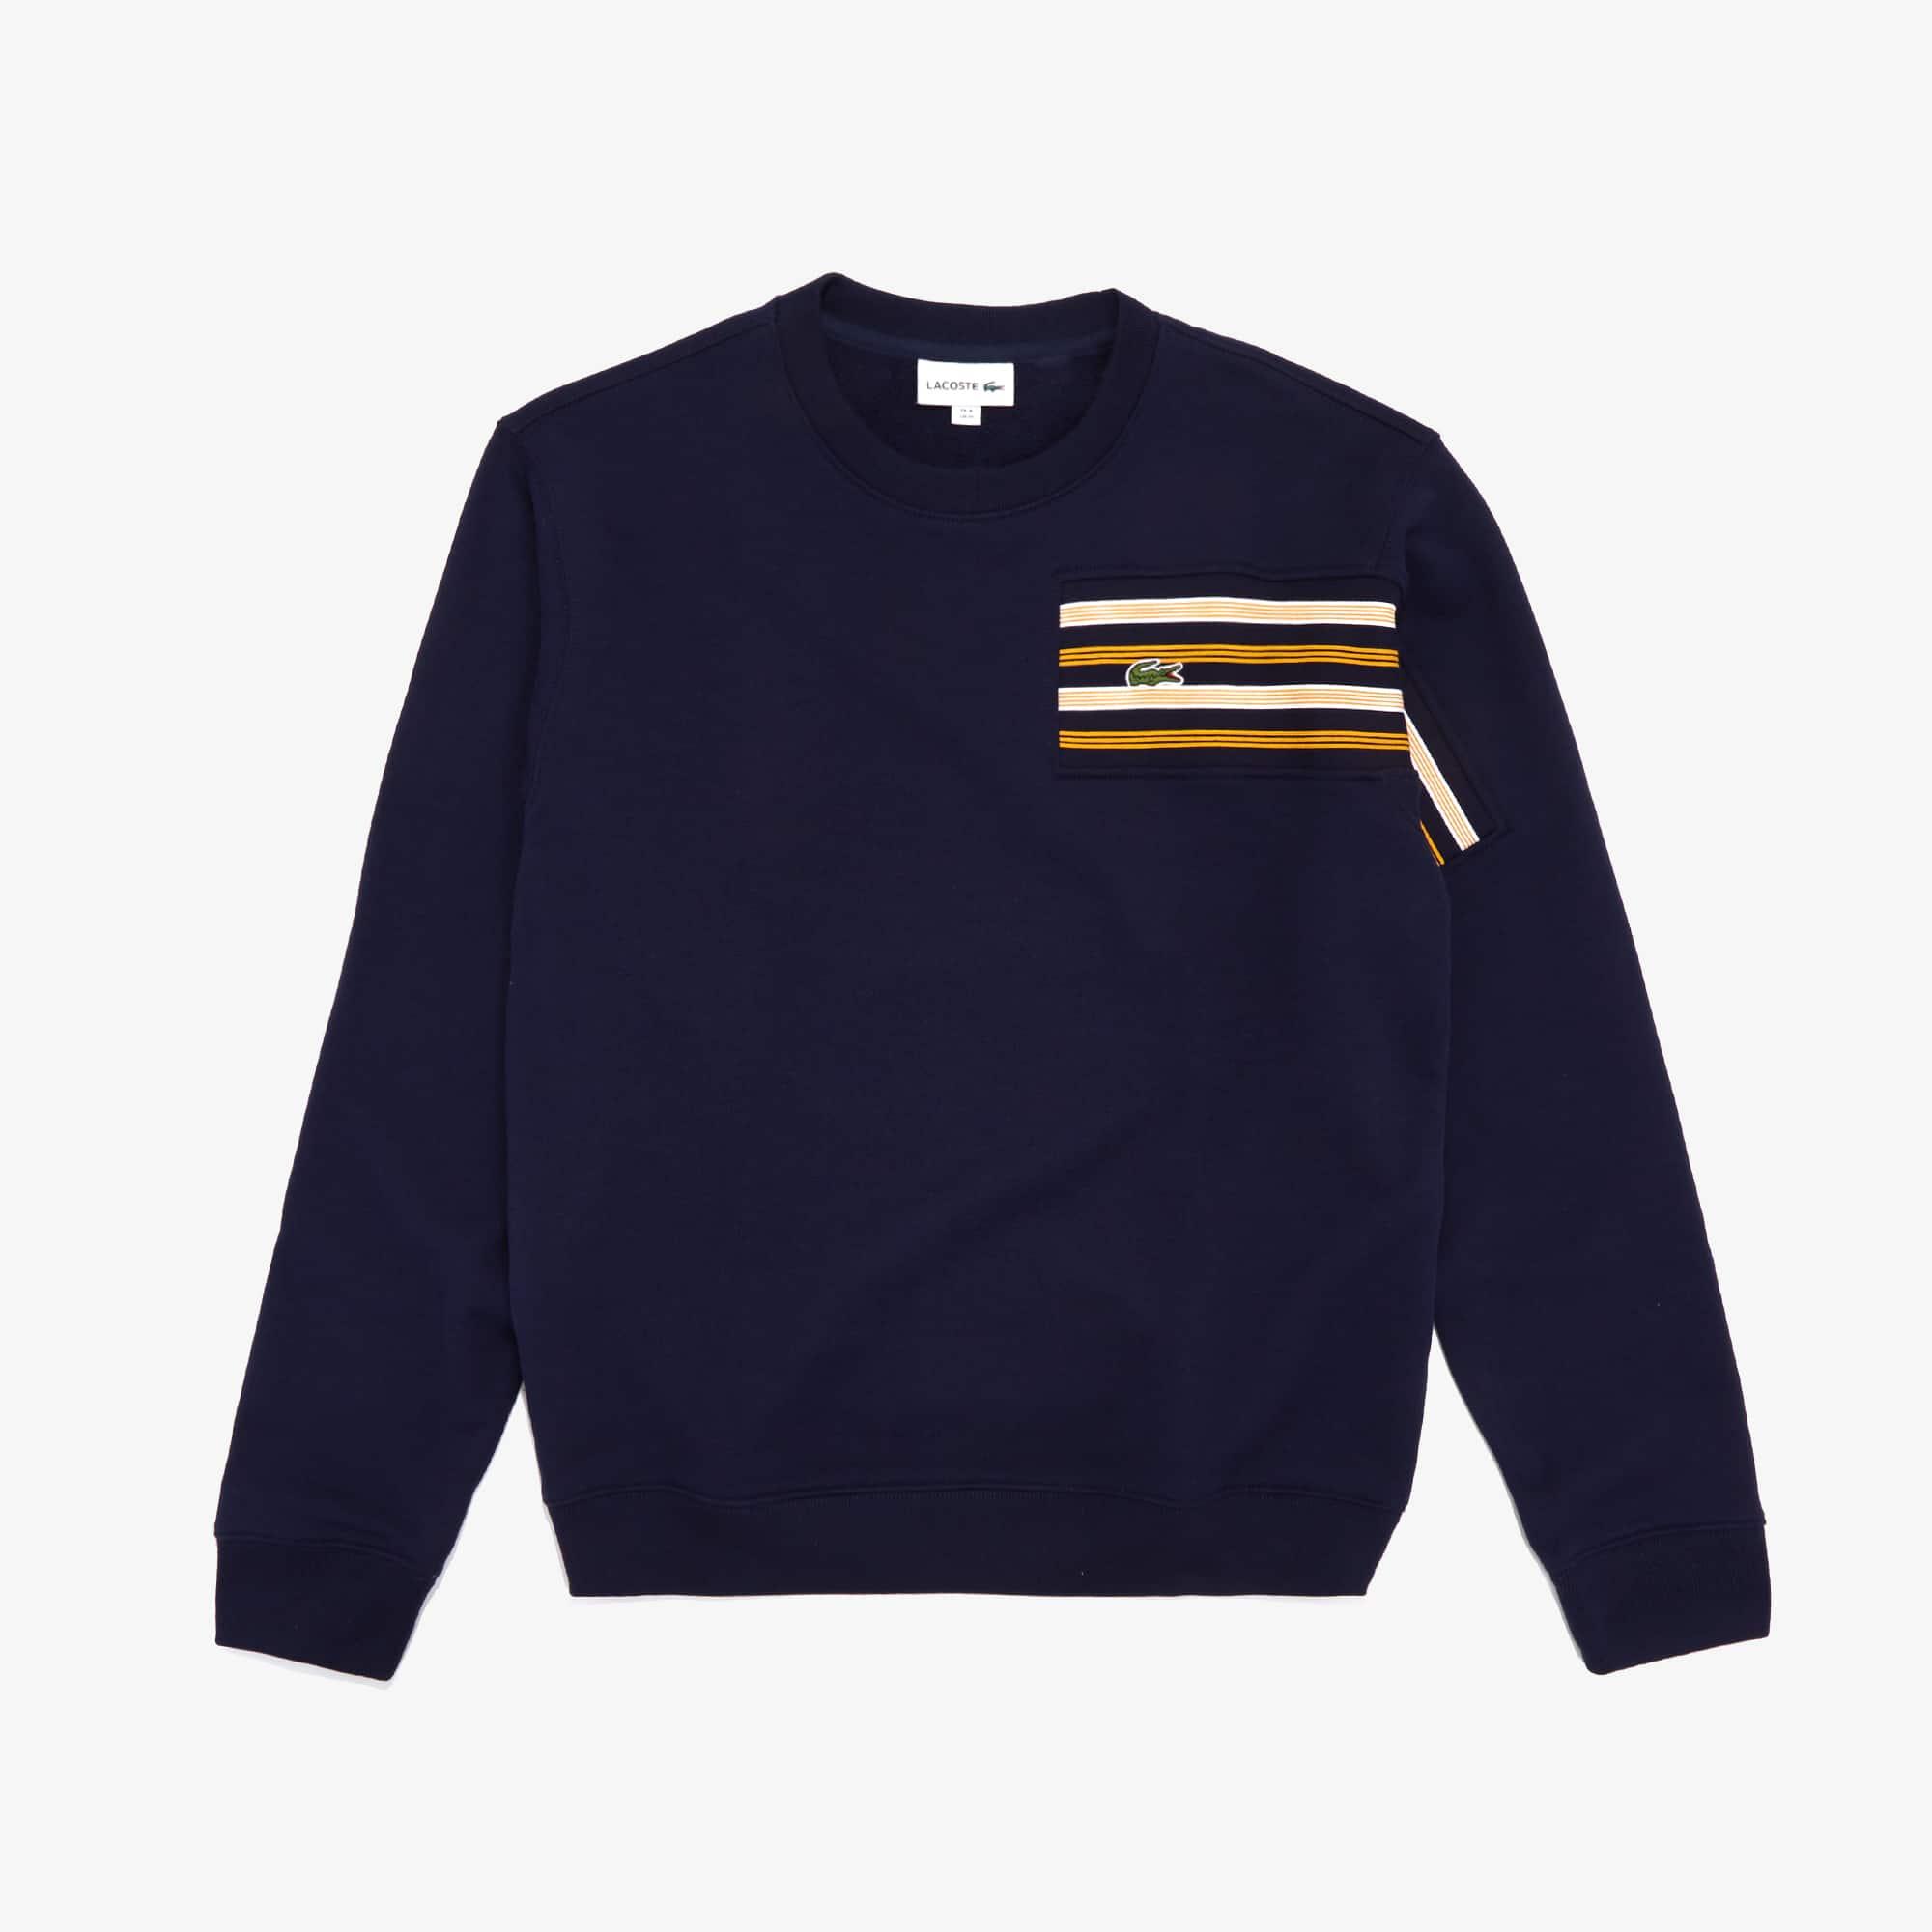 Lacoste Tops Men's Striped Panel Cotton Fleece Sweatshirt